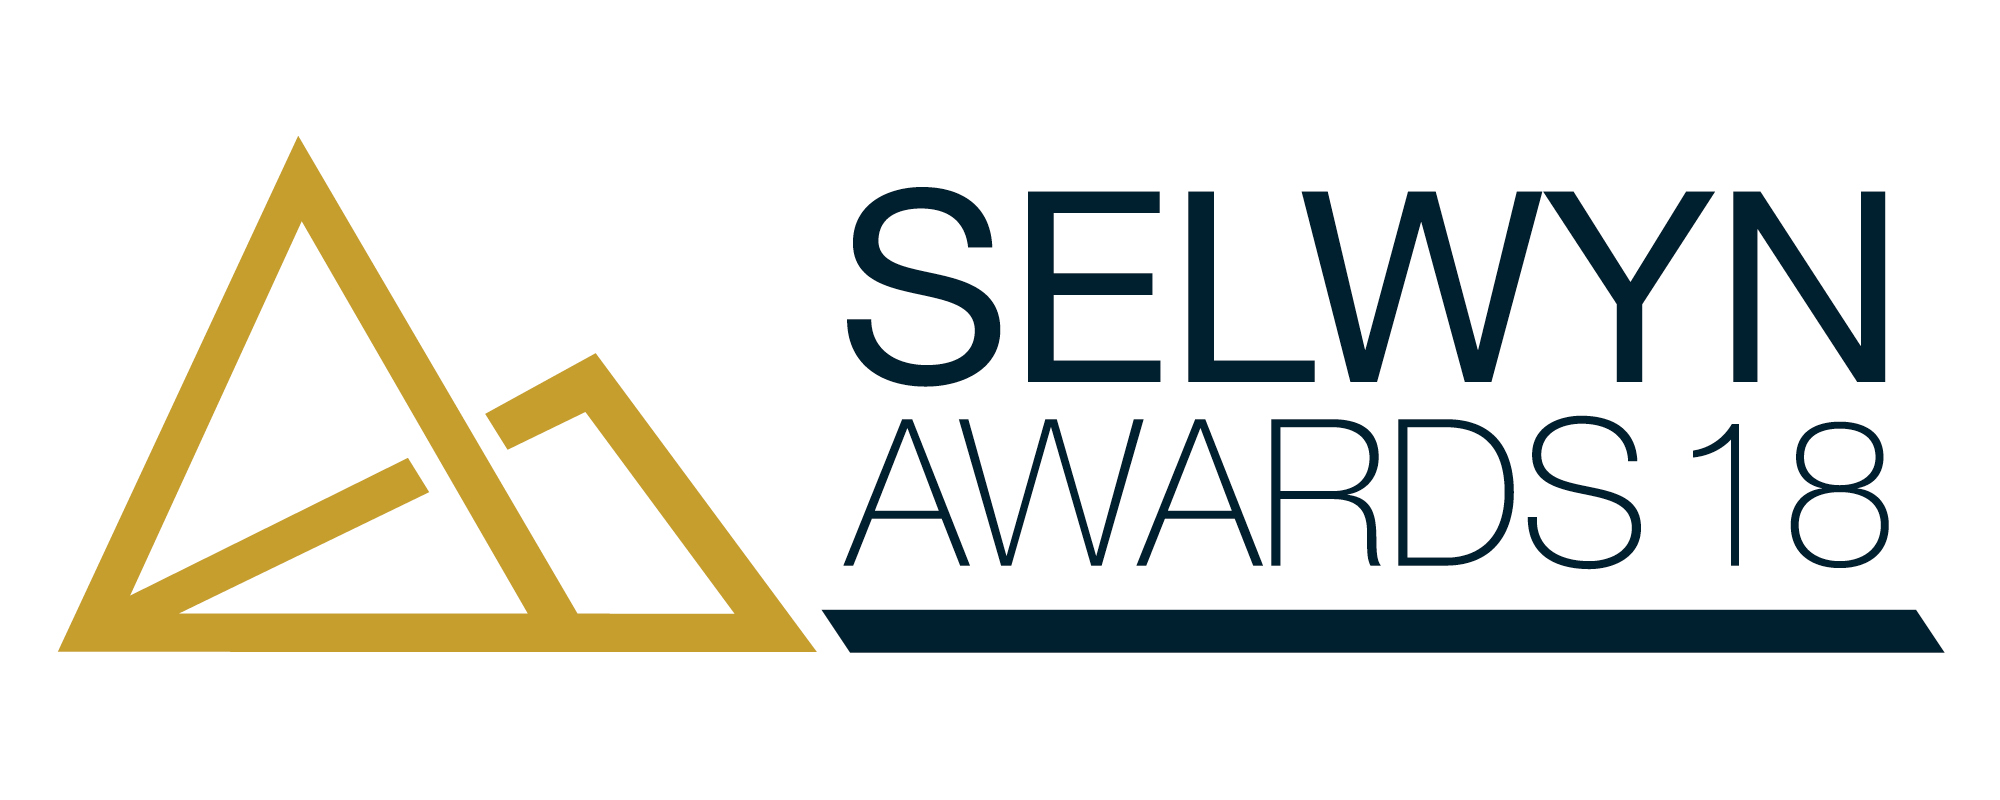 Selwyn Awards 1 DEFAULT white background.jpg